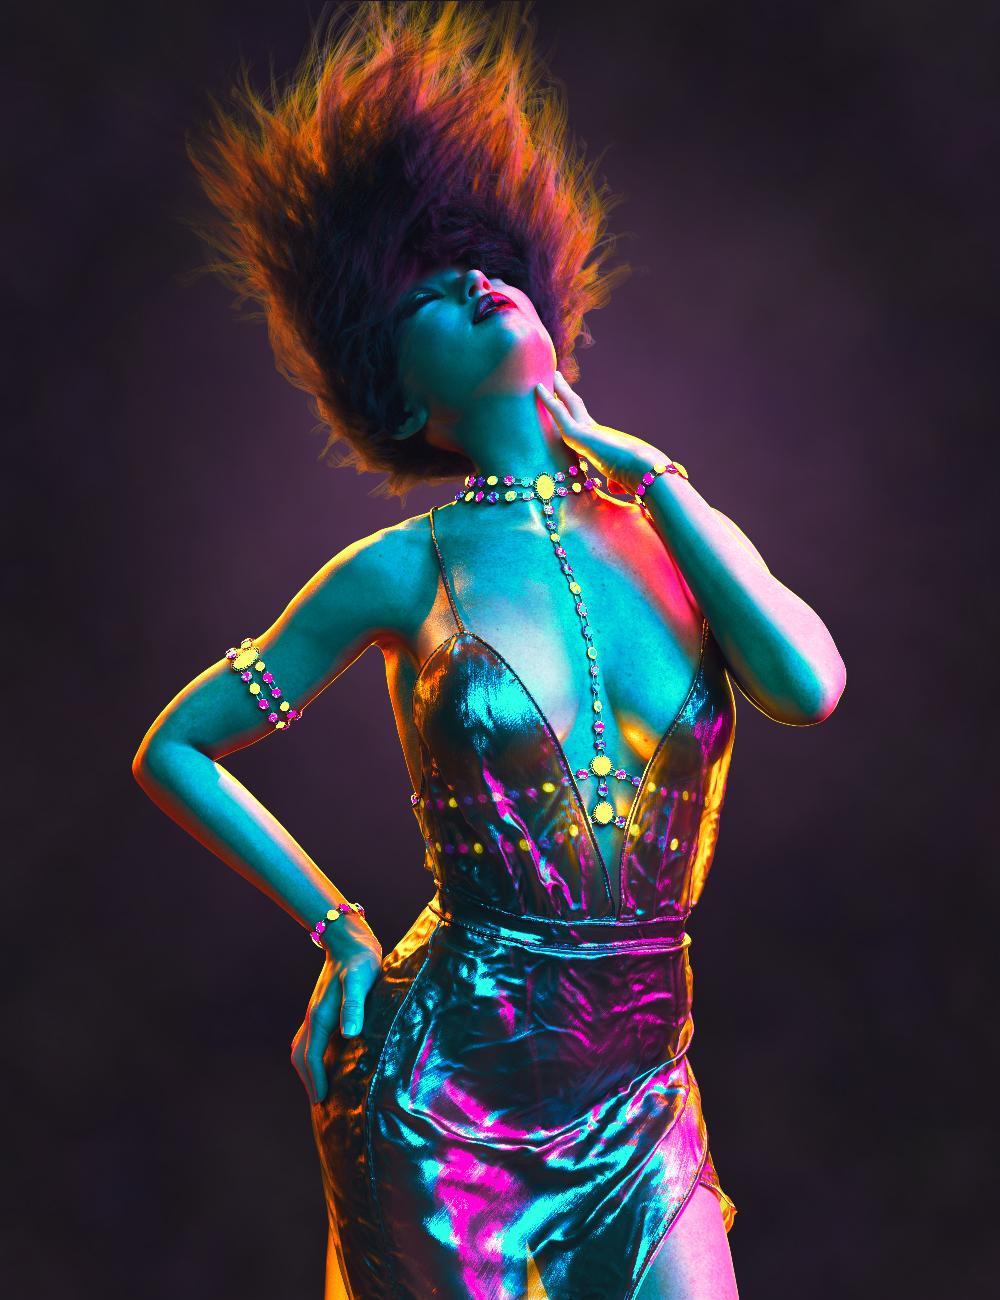 PTF Neon Splash Lighting Suite by: PixelTizzyFit, 3D Models by Daz 3D